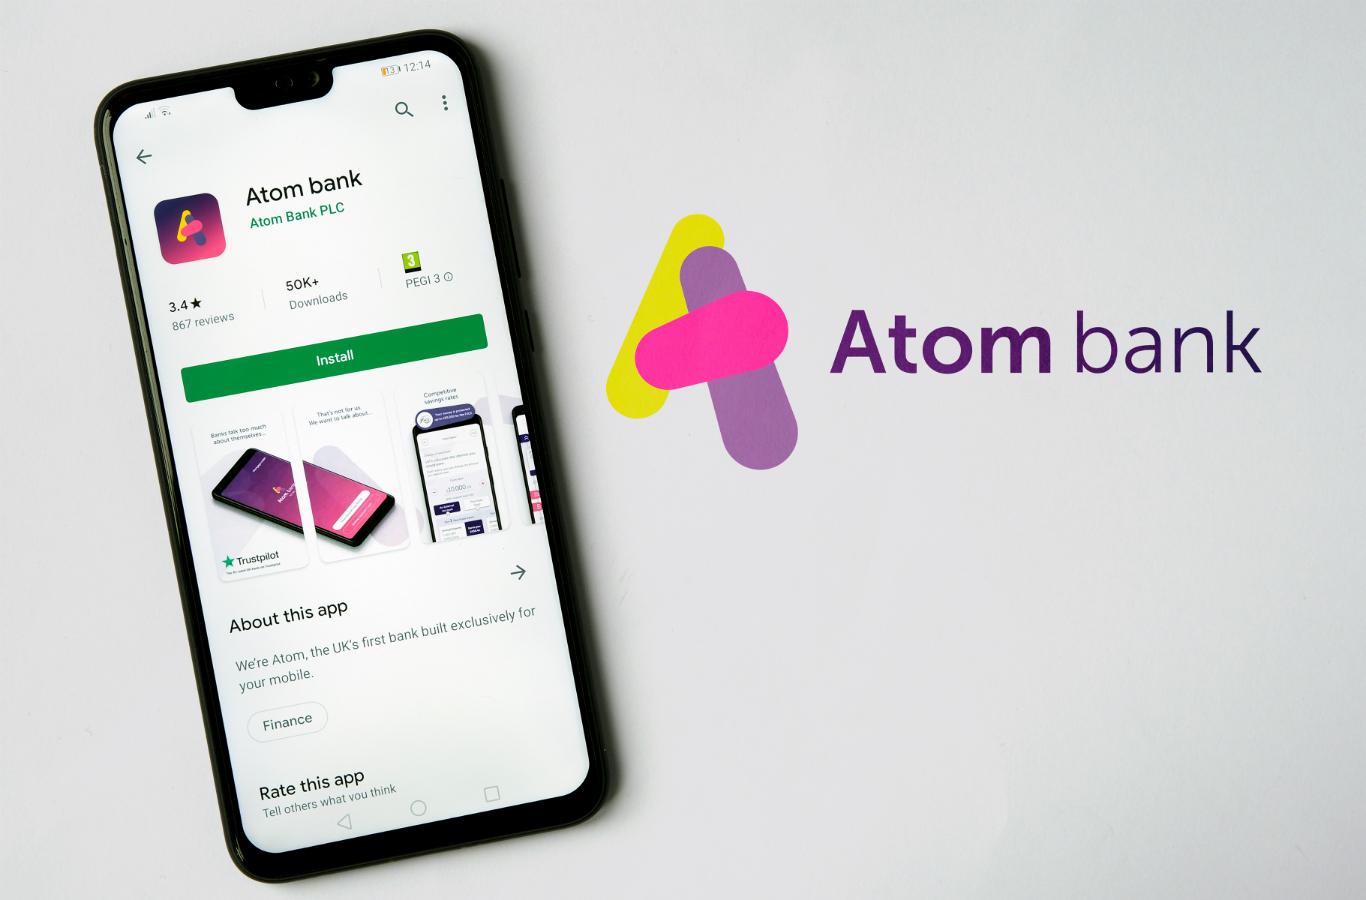 Atom Bank (Image: Shutterstock)